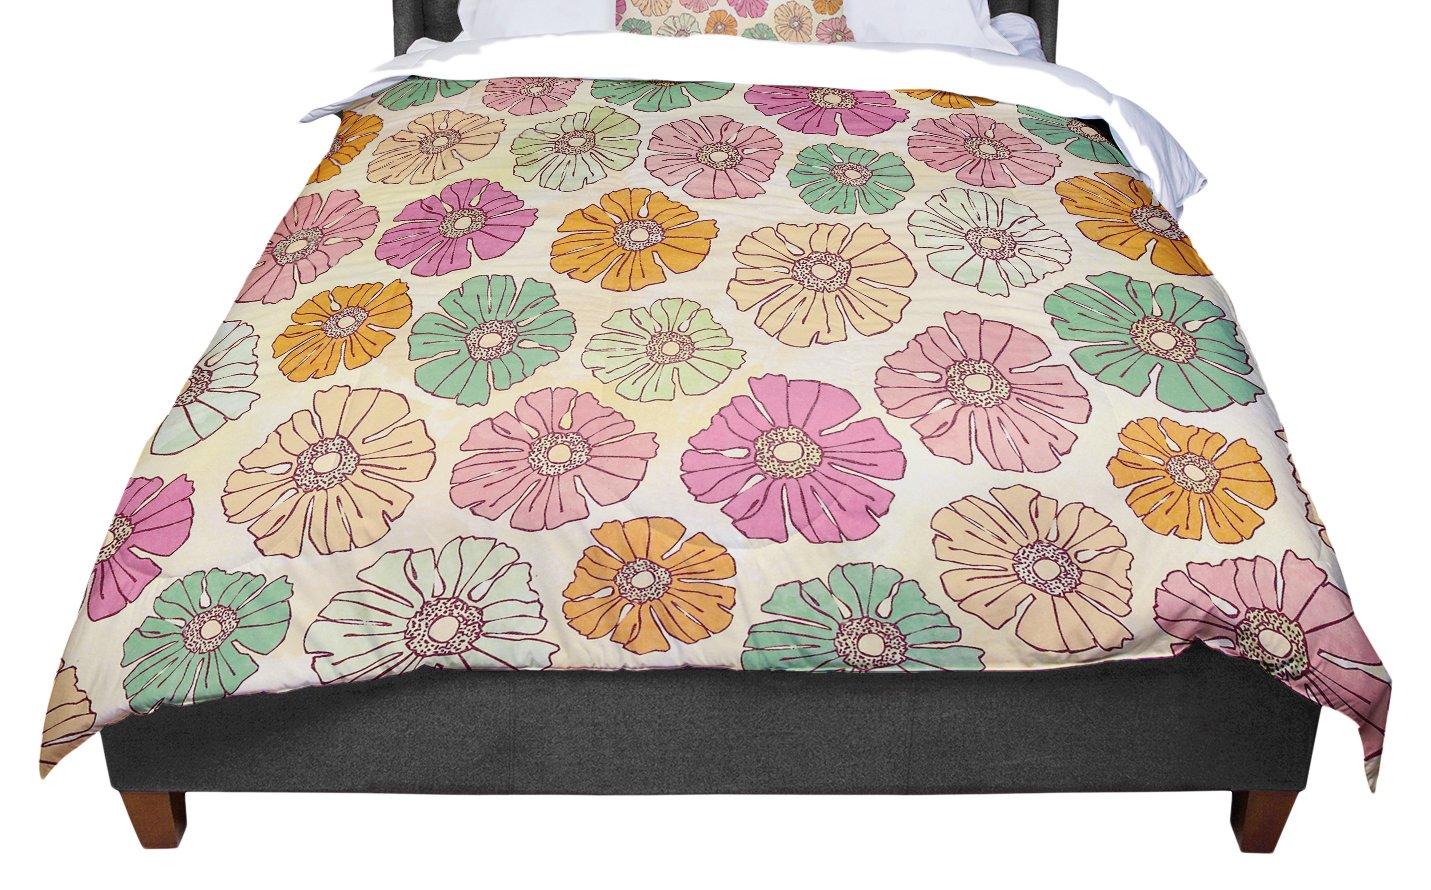 KESS InHouse Heidi Jennings Vintage Petals Tan Pink Twin Comforter 68 X 88